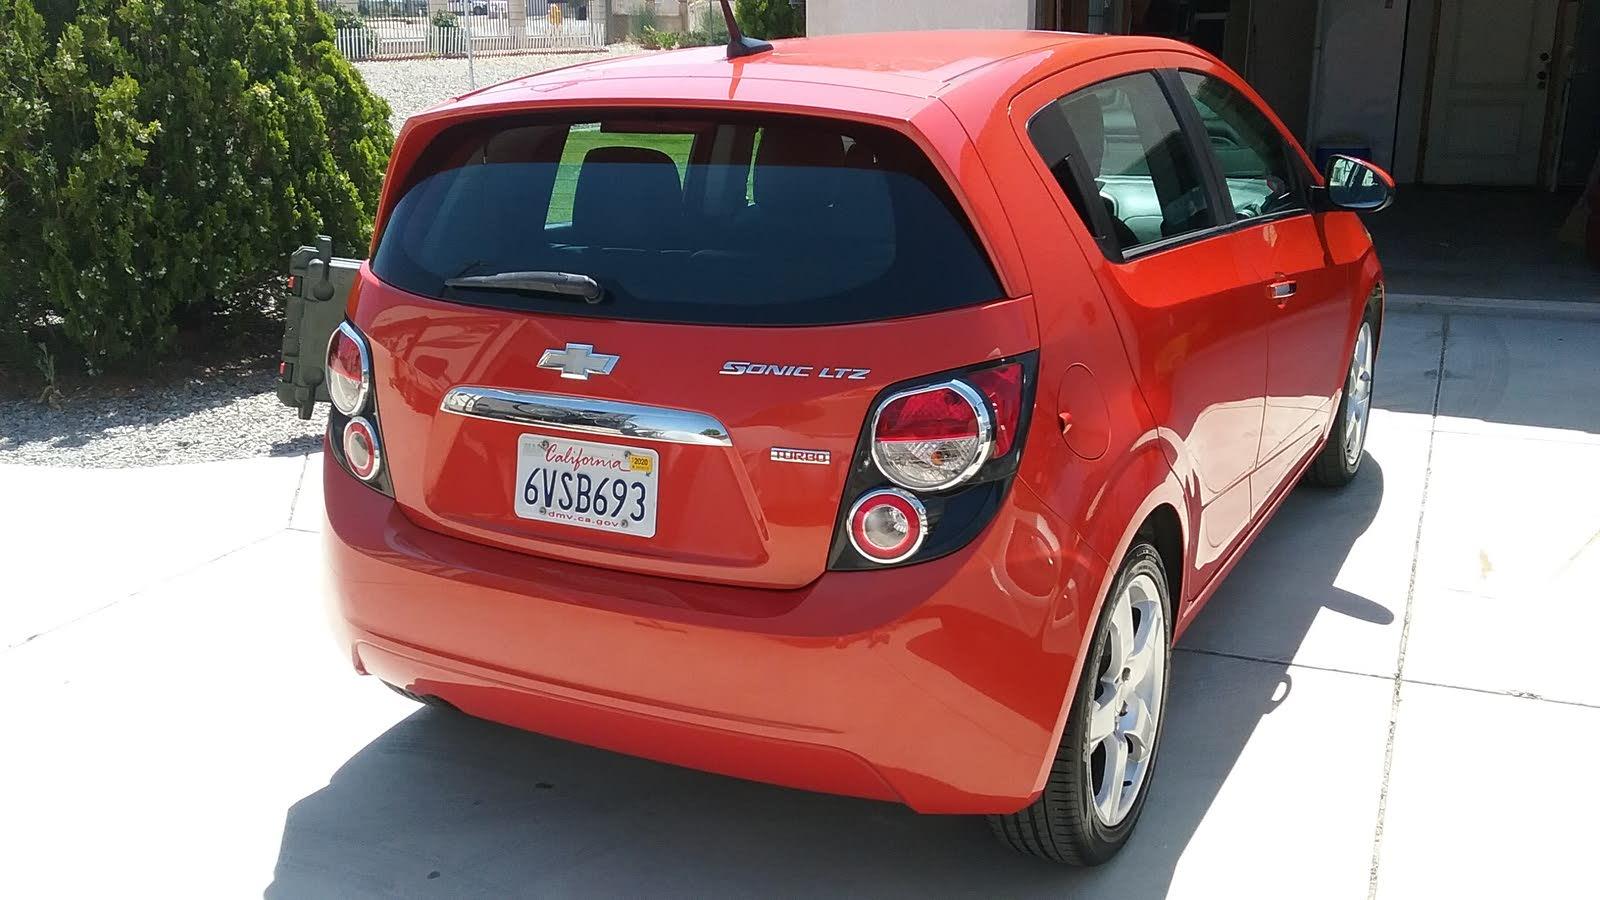 2012 Chevrolet Sonic Ltz